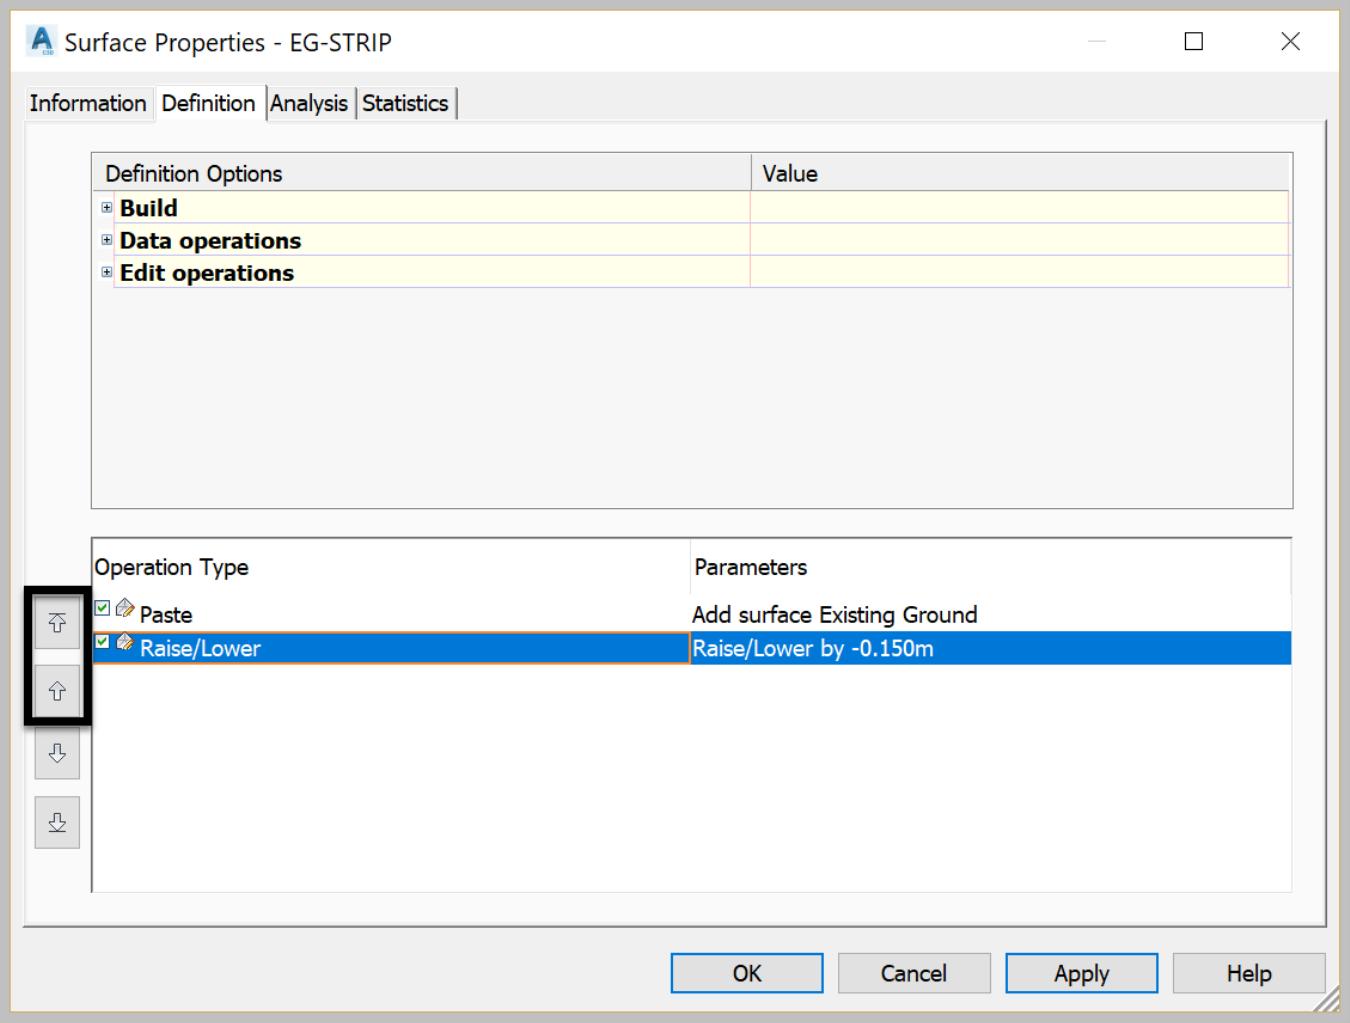 C:\Users\Infratech.Civil\AppData\Local\Microsoft\Windows\INetCache\Content.MSO\C83F2422.tmp